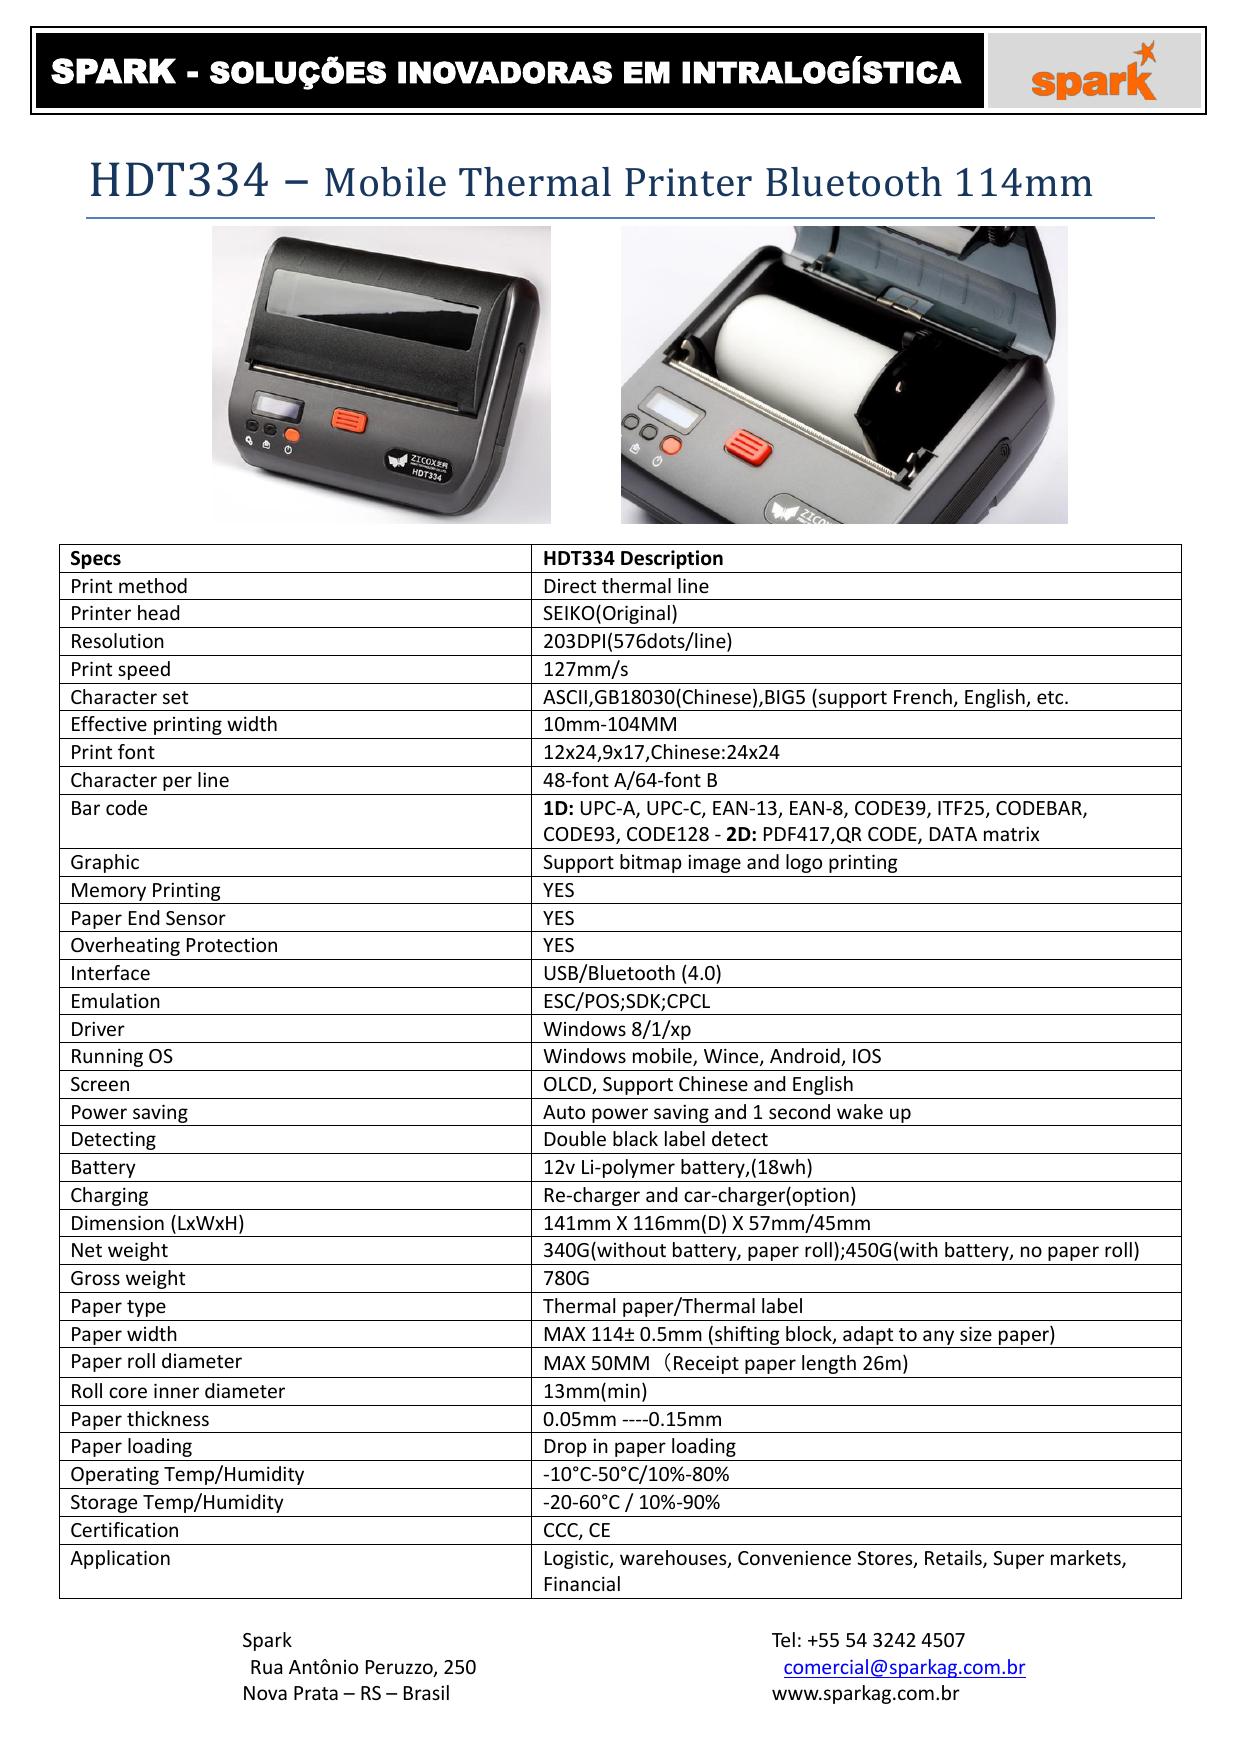 HDT334 – Mobile Thermal Printer Bluetooth 114mm | manualzz com